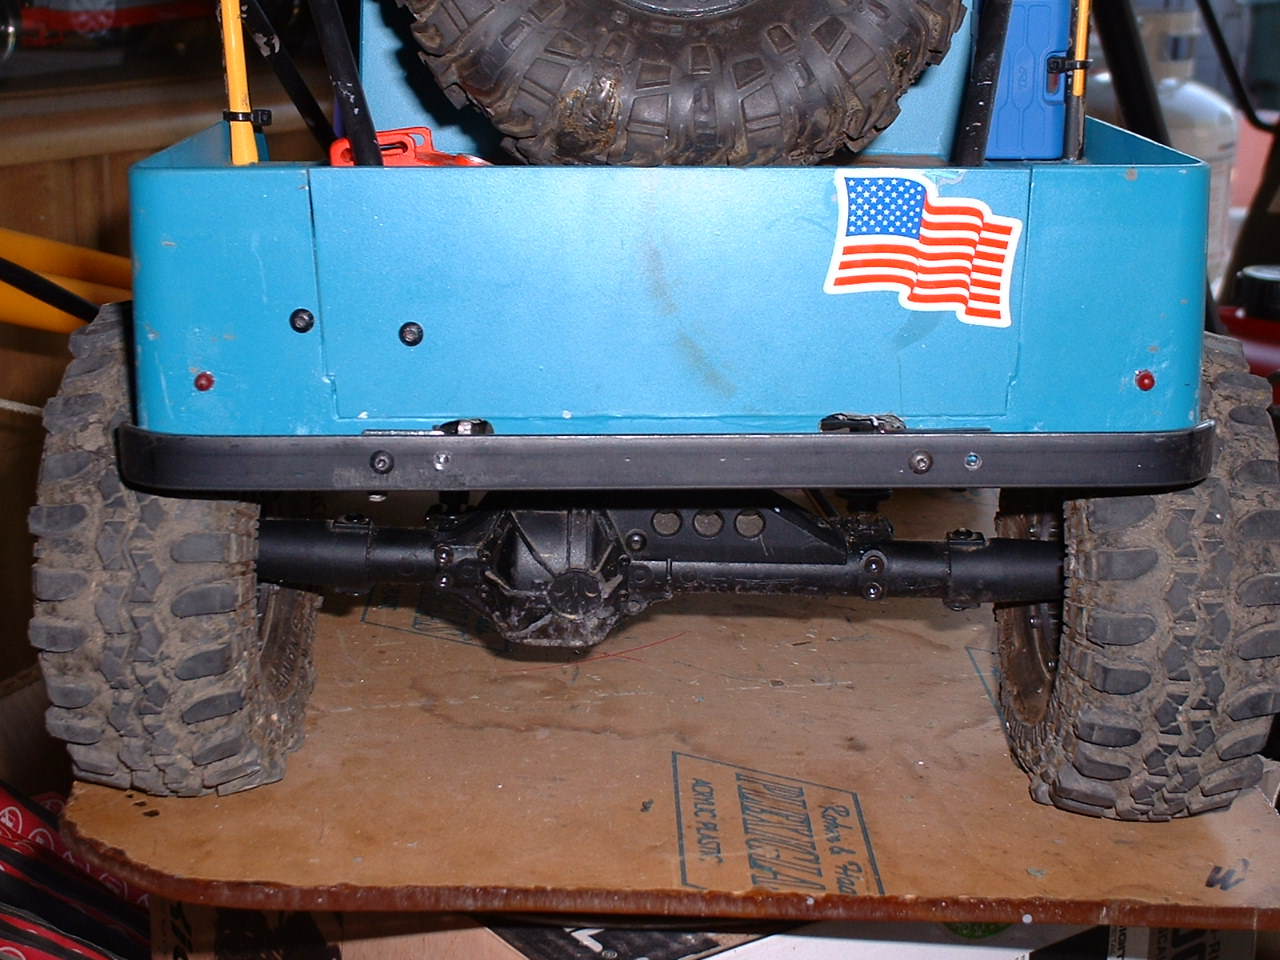 Click image for larger version  Name:G.I. Joe Jeep 7c 004.JPG Views:892 Size:314.1 KB ID:2096624